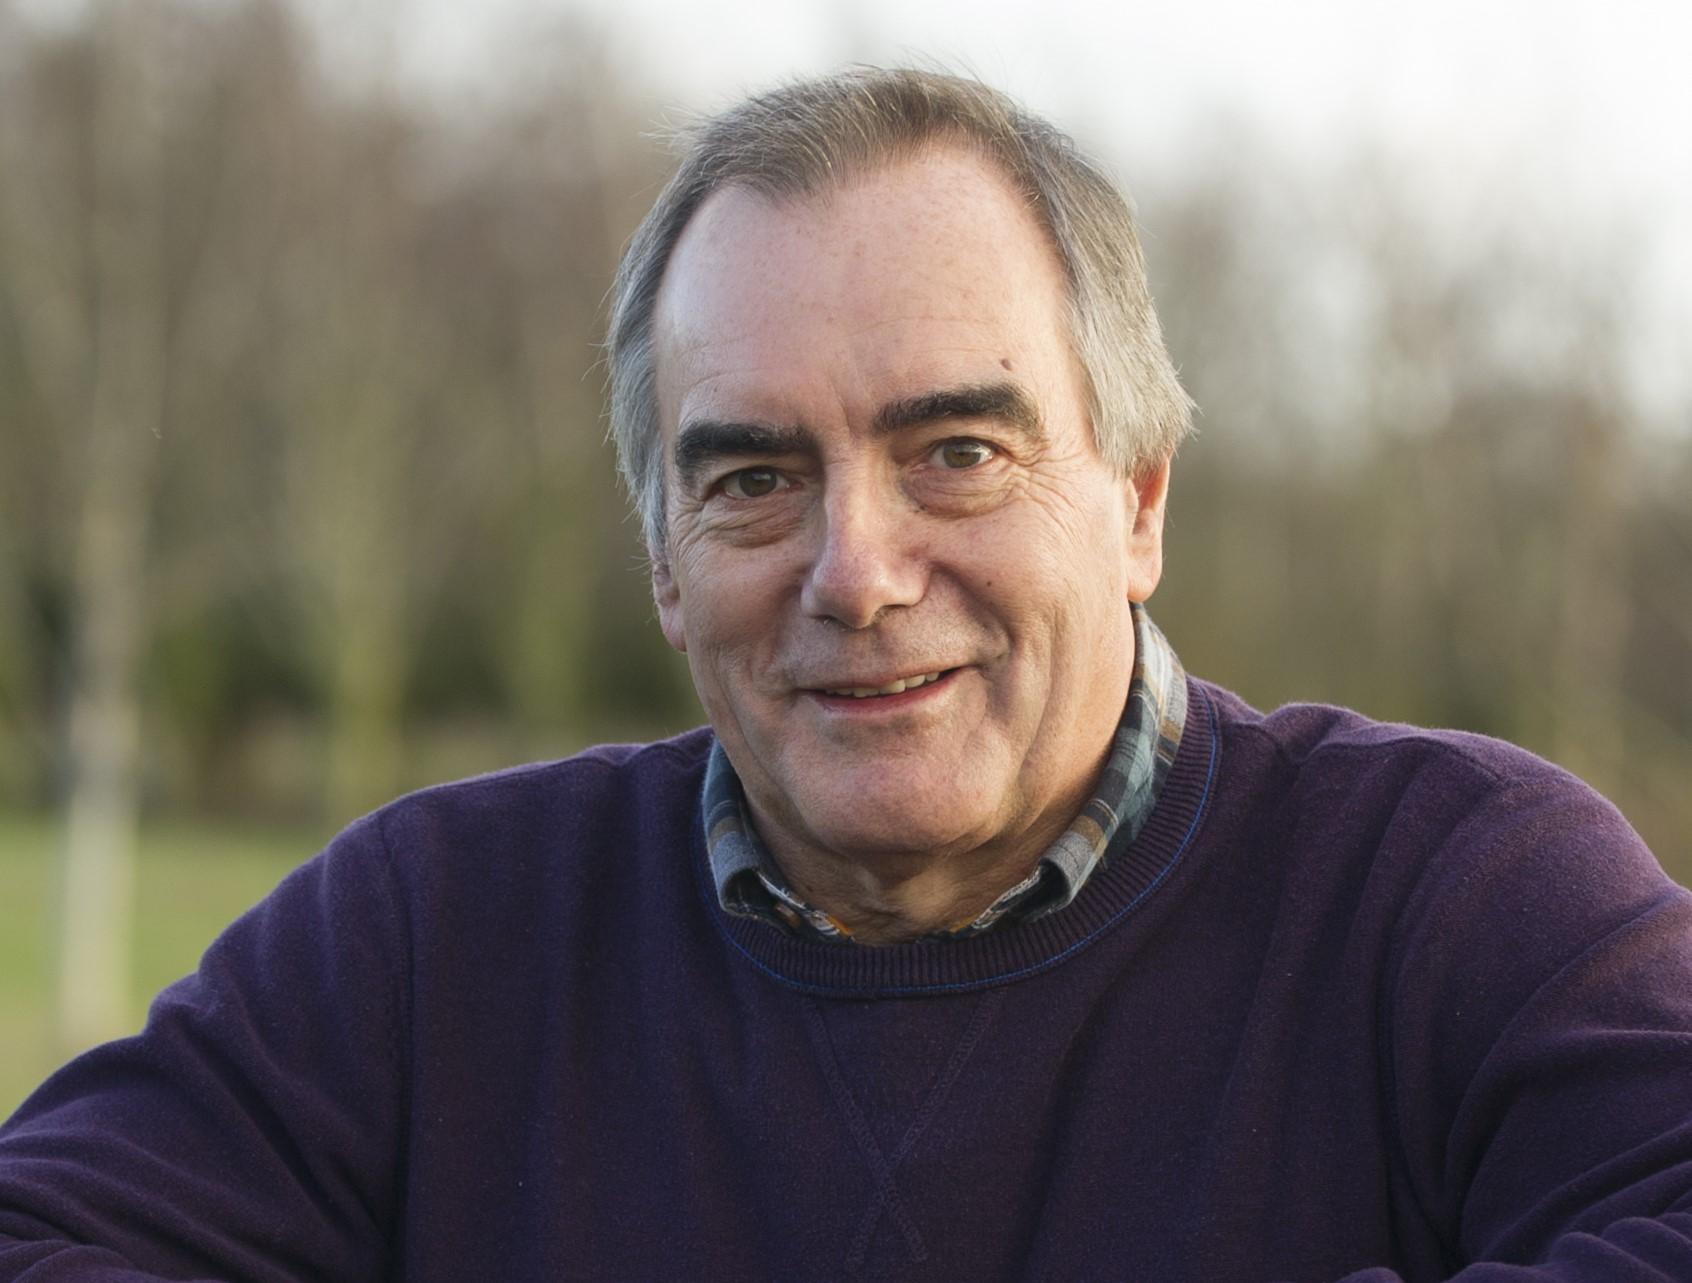 David Harwood